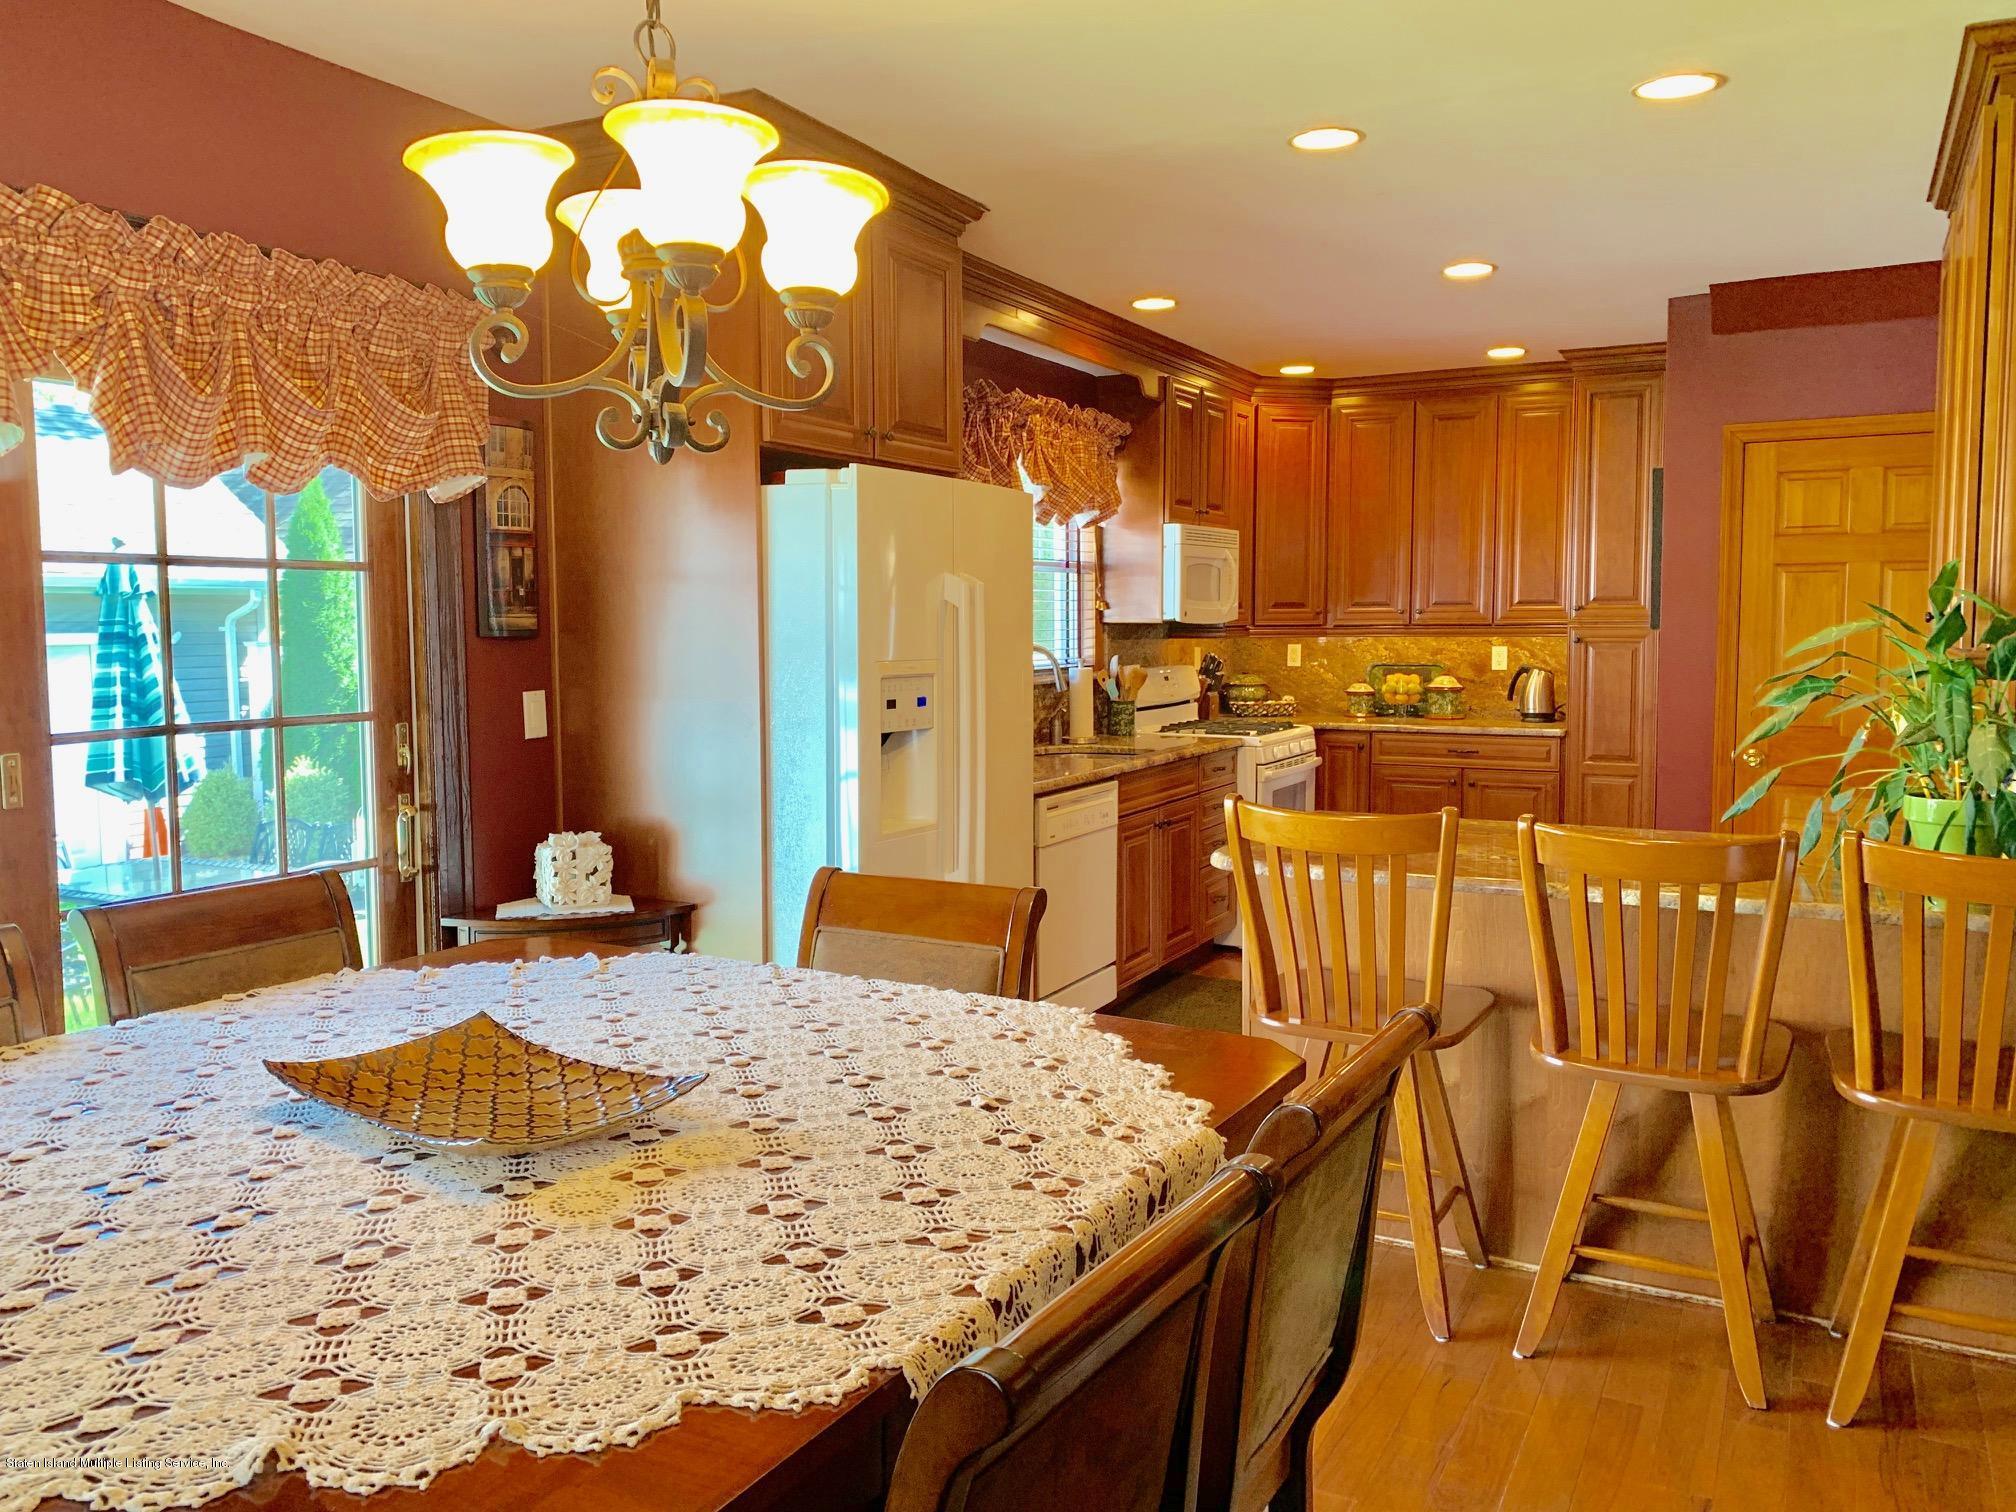 Single Family - Detached 195 Fairview Avenue  Staten Island, NY 10314, MLS-1132423-13